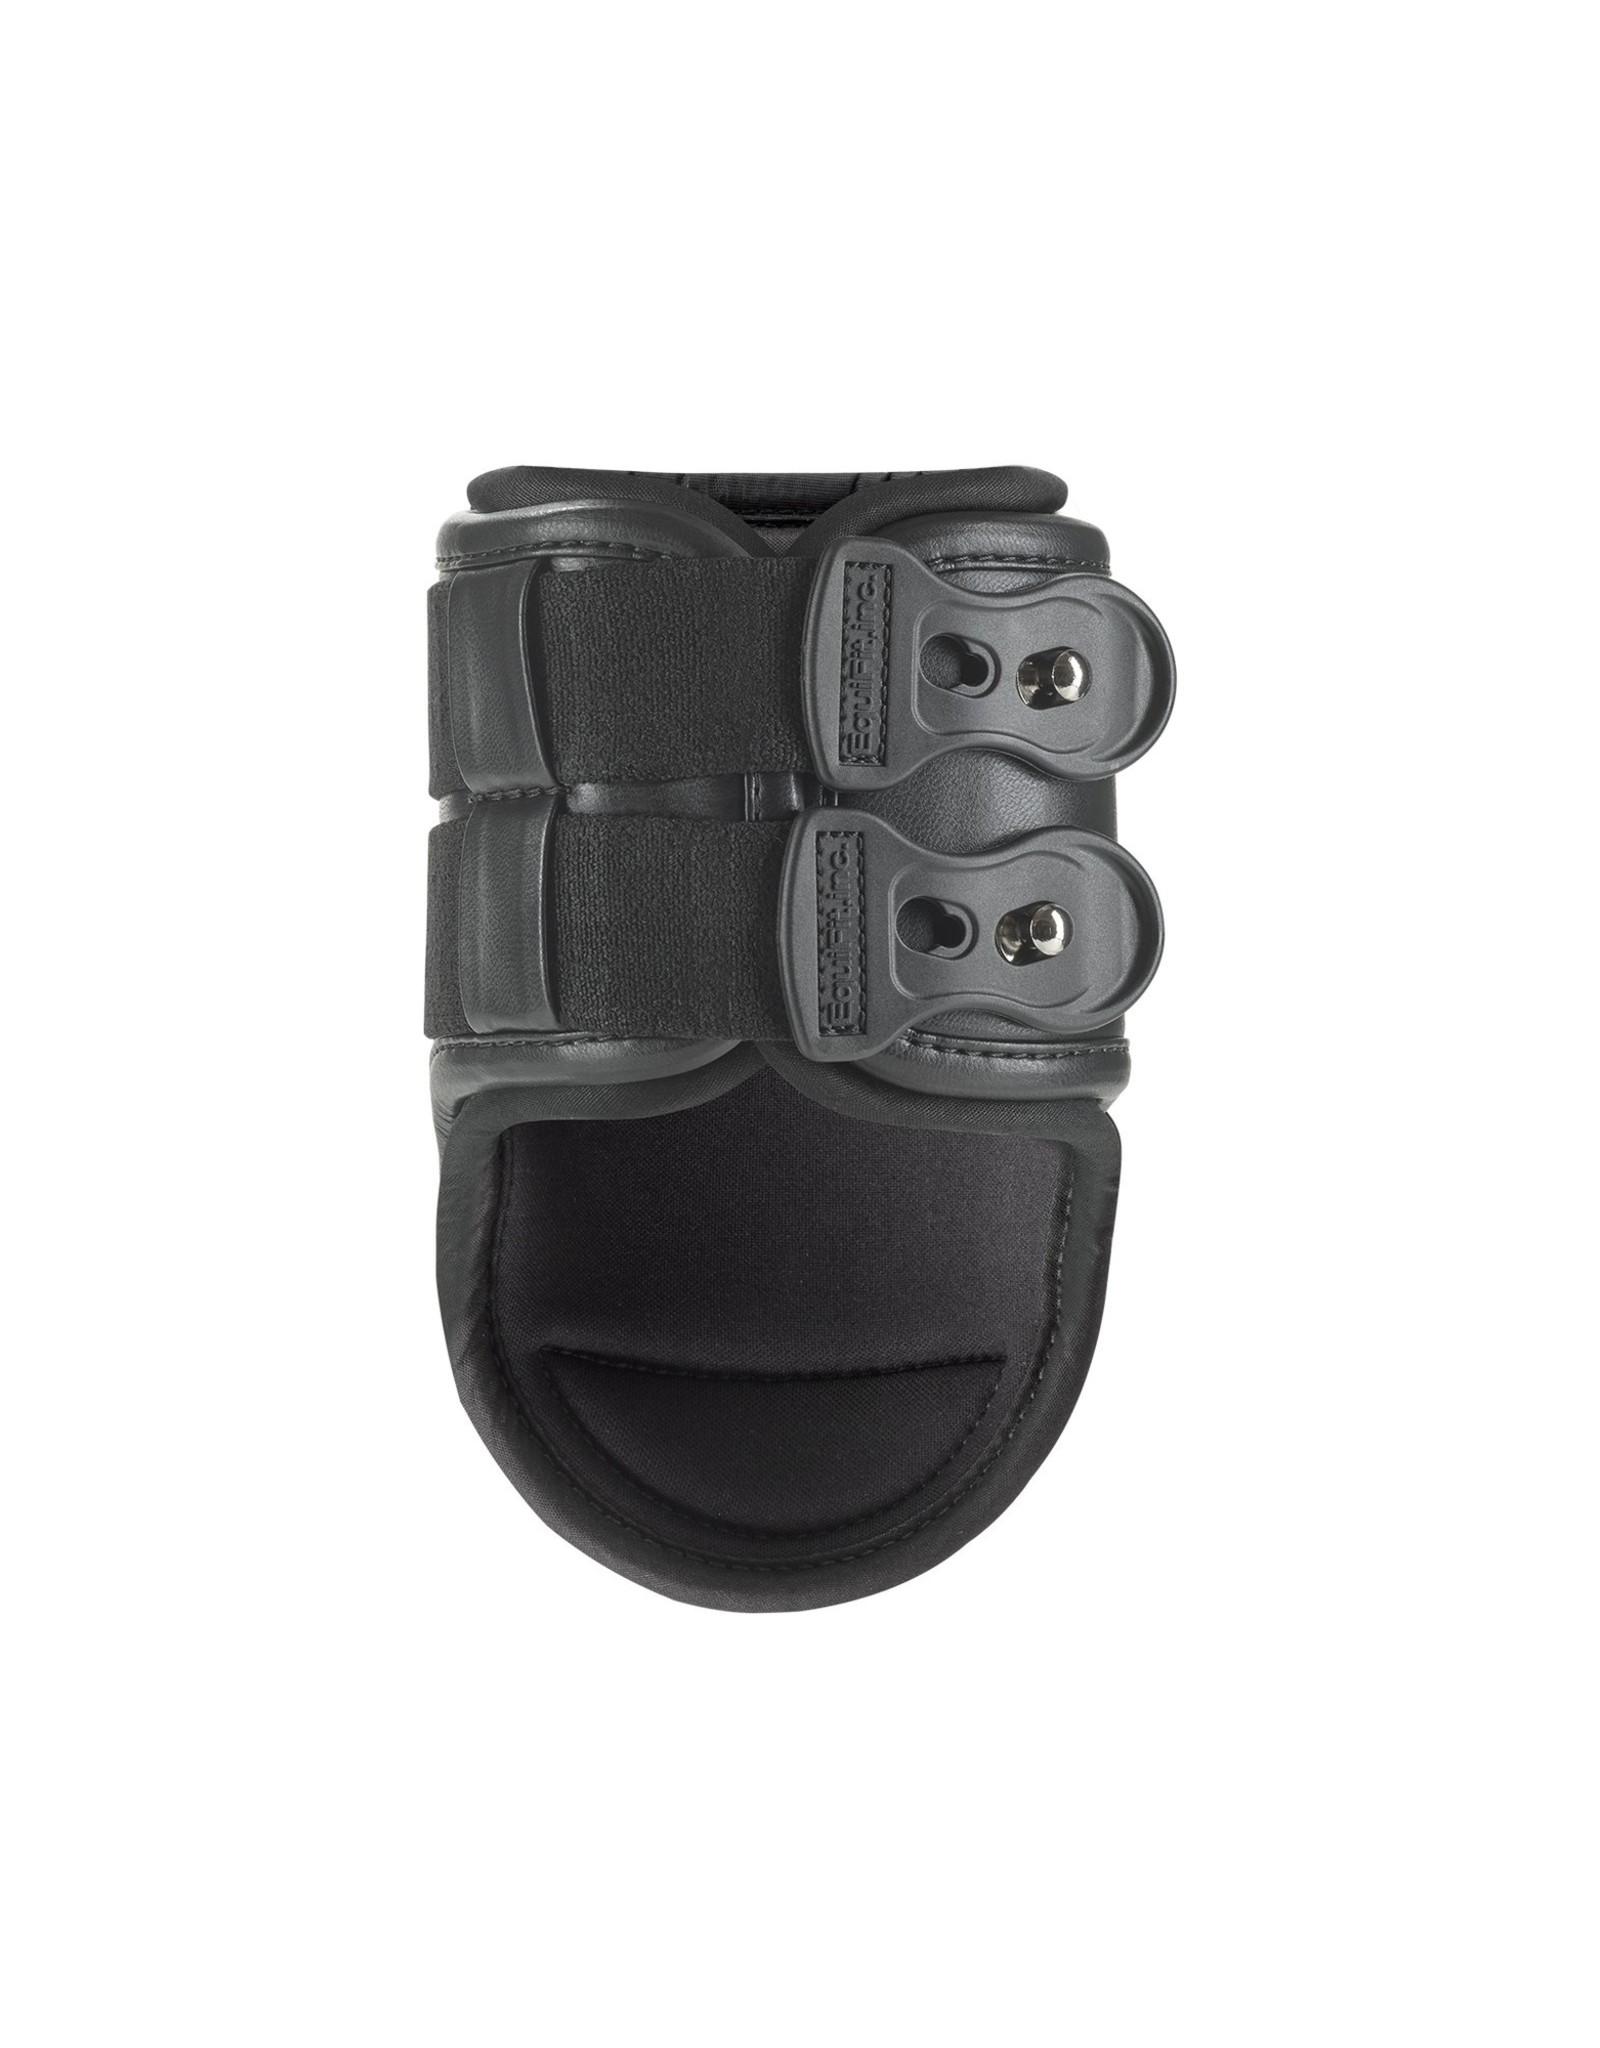 EQUIFIT EQ-TEQ™ HIND BOOT (IMPACTEQ)